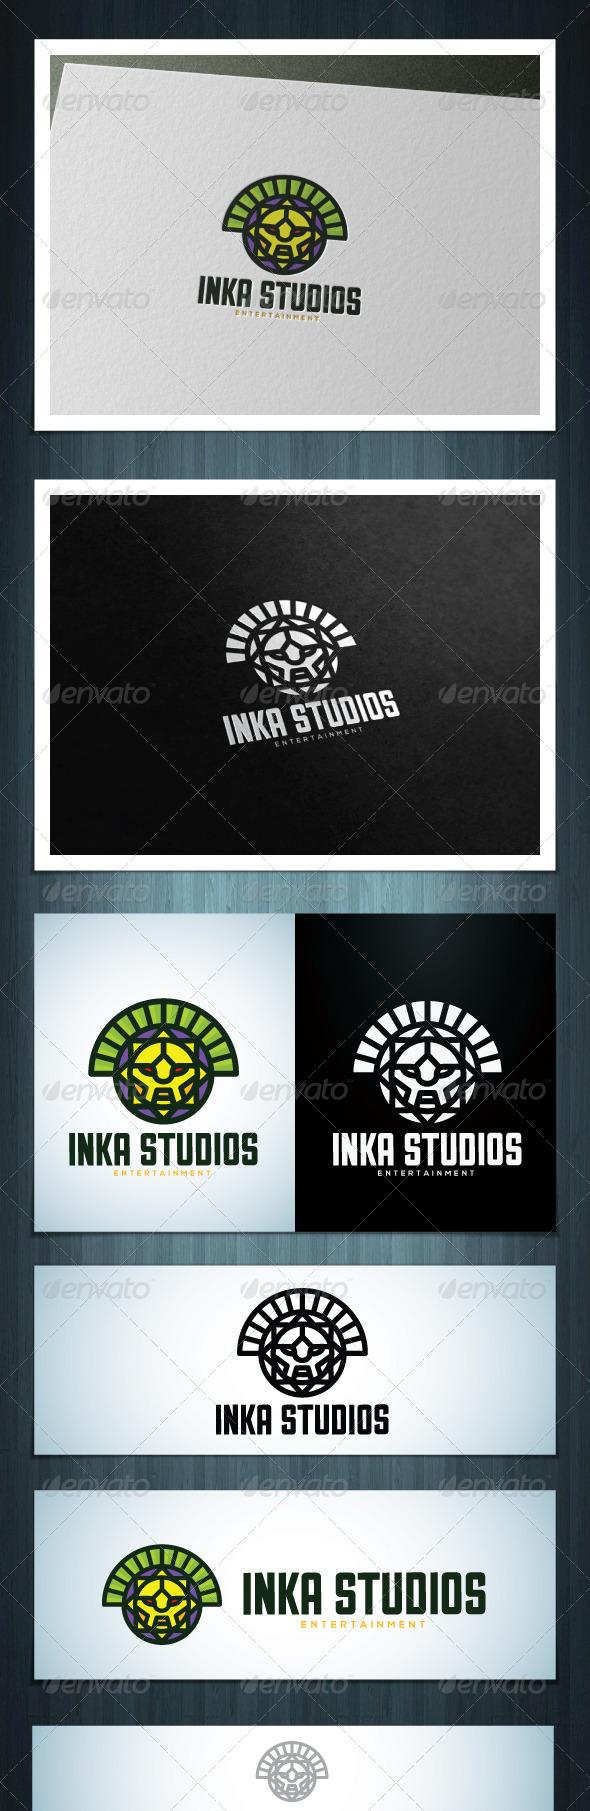 Inka Studios